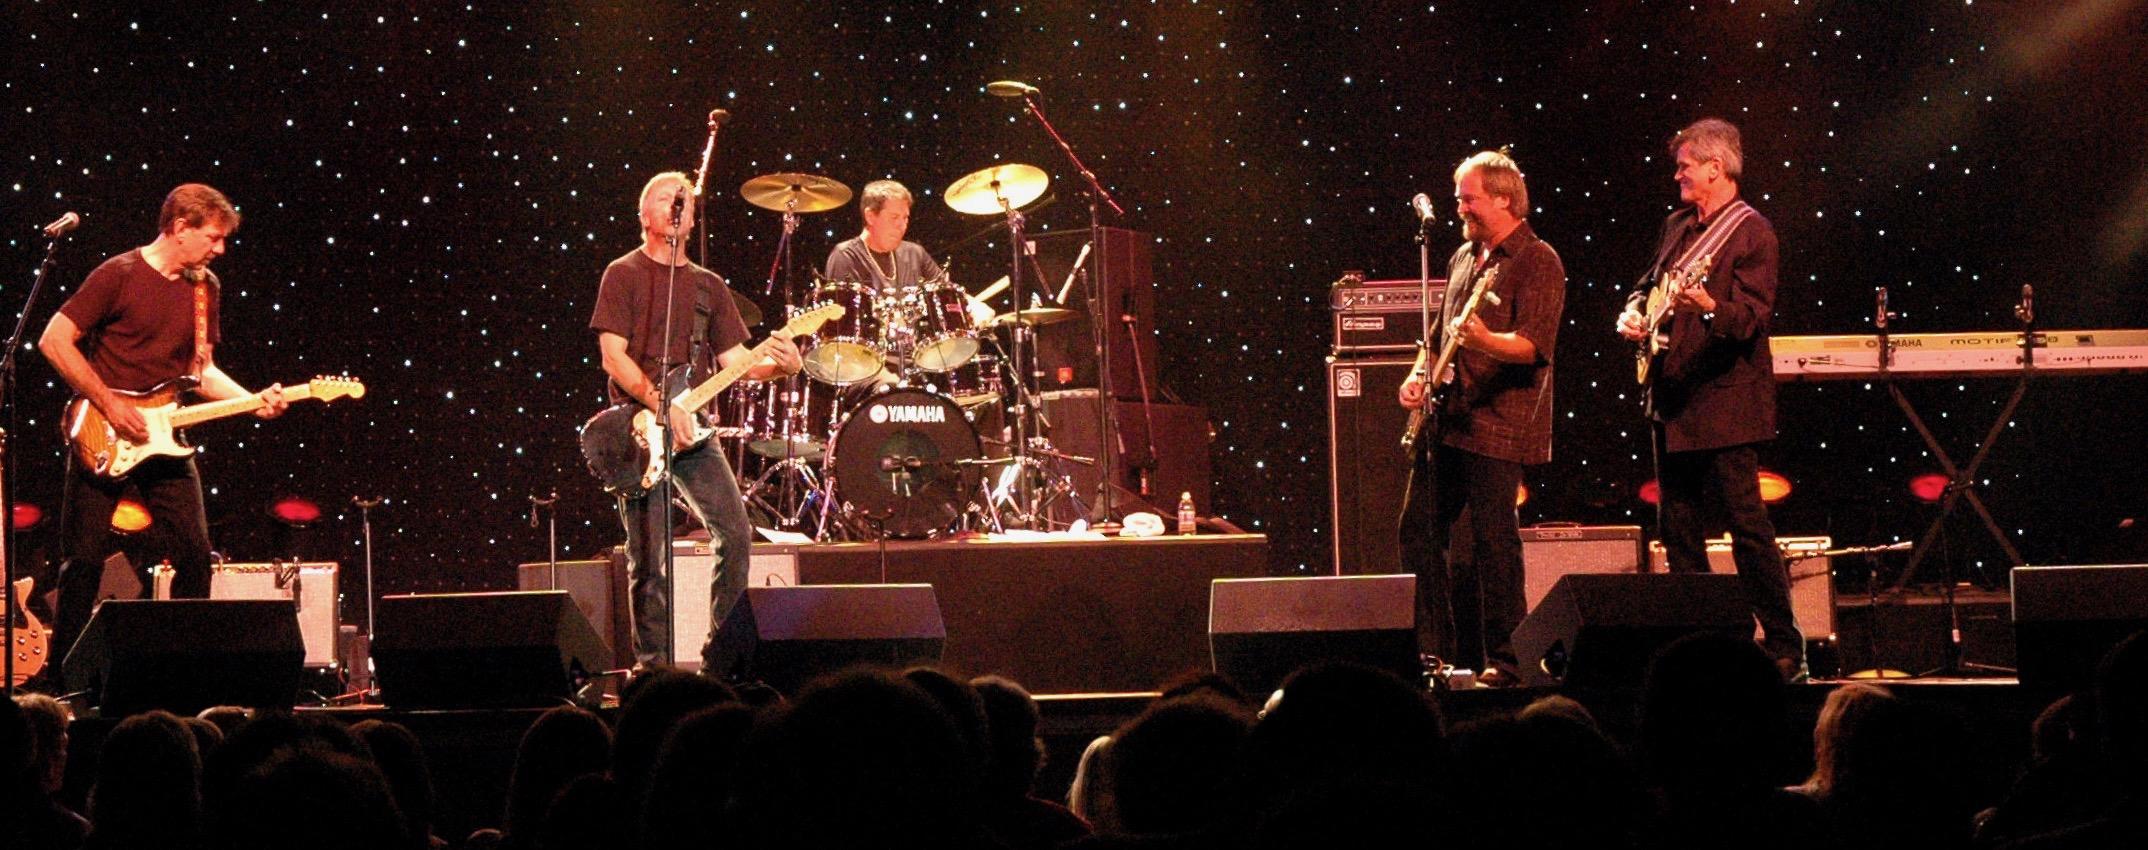 The Kingsmen on Stage